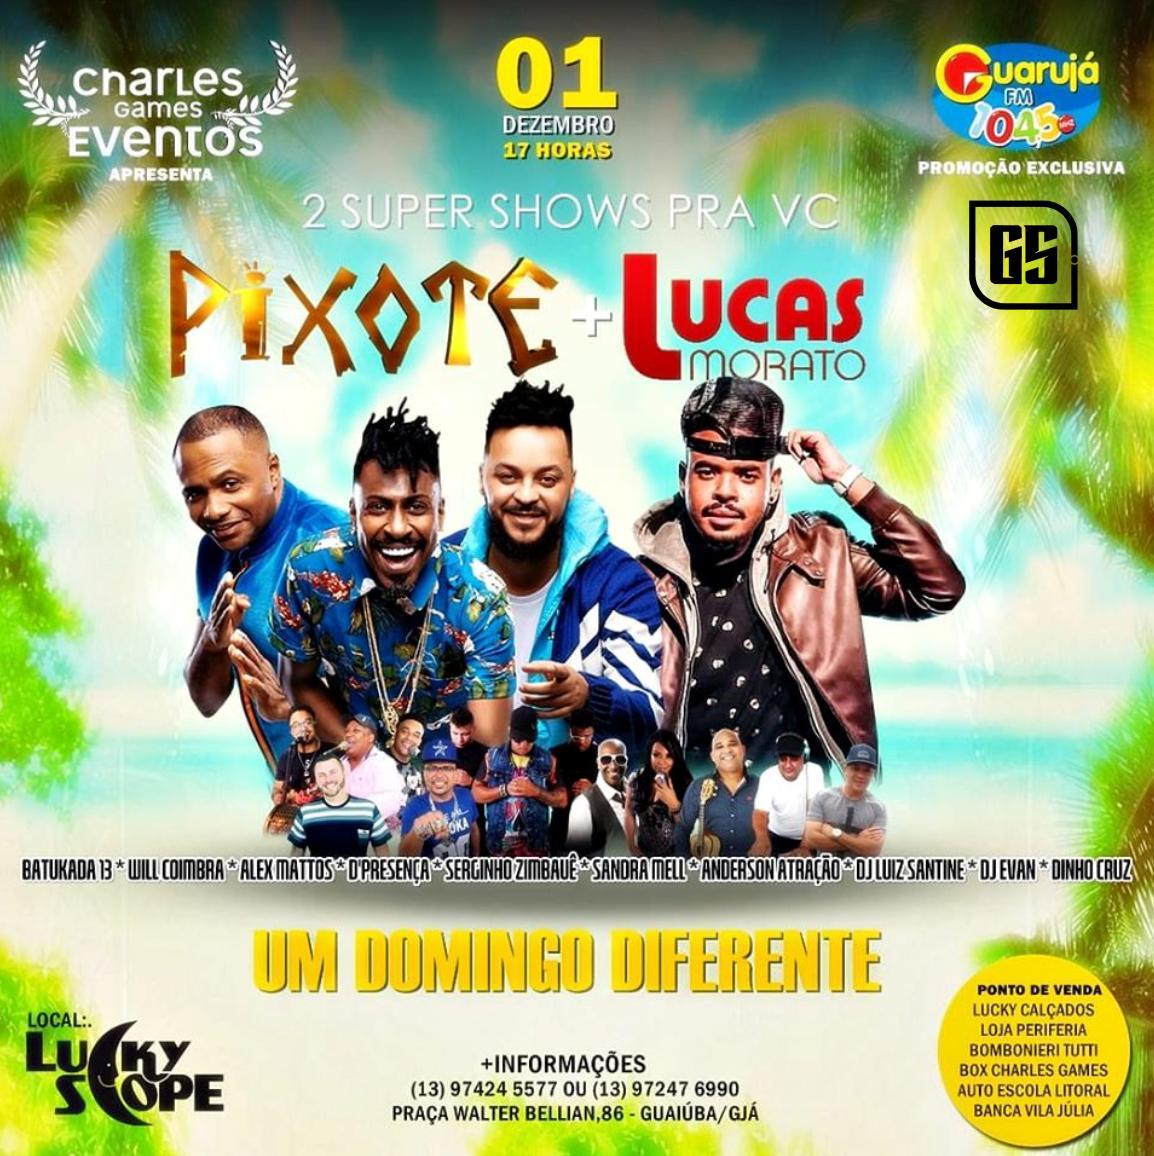 Pixote e Lucas Morato - 01/12/19 - Guarujá - SP